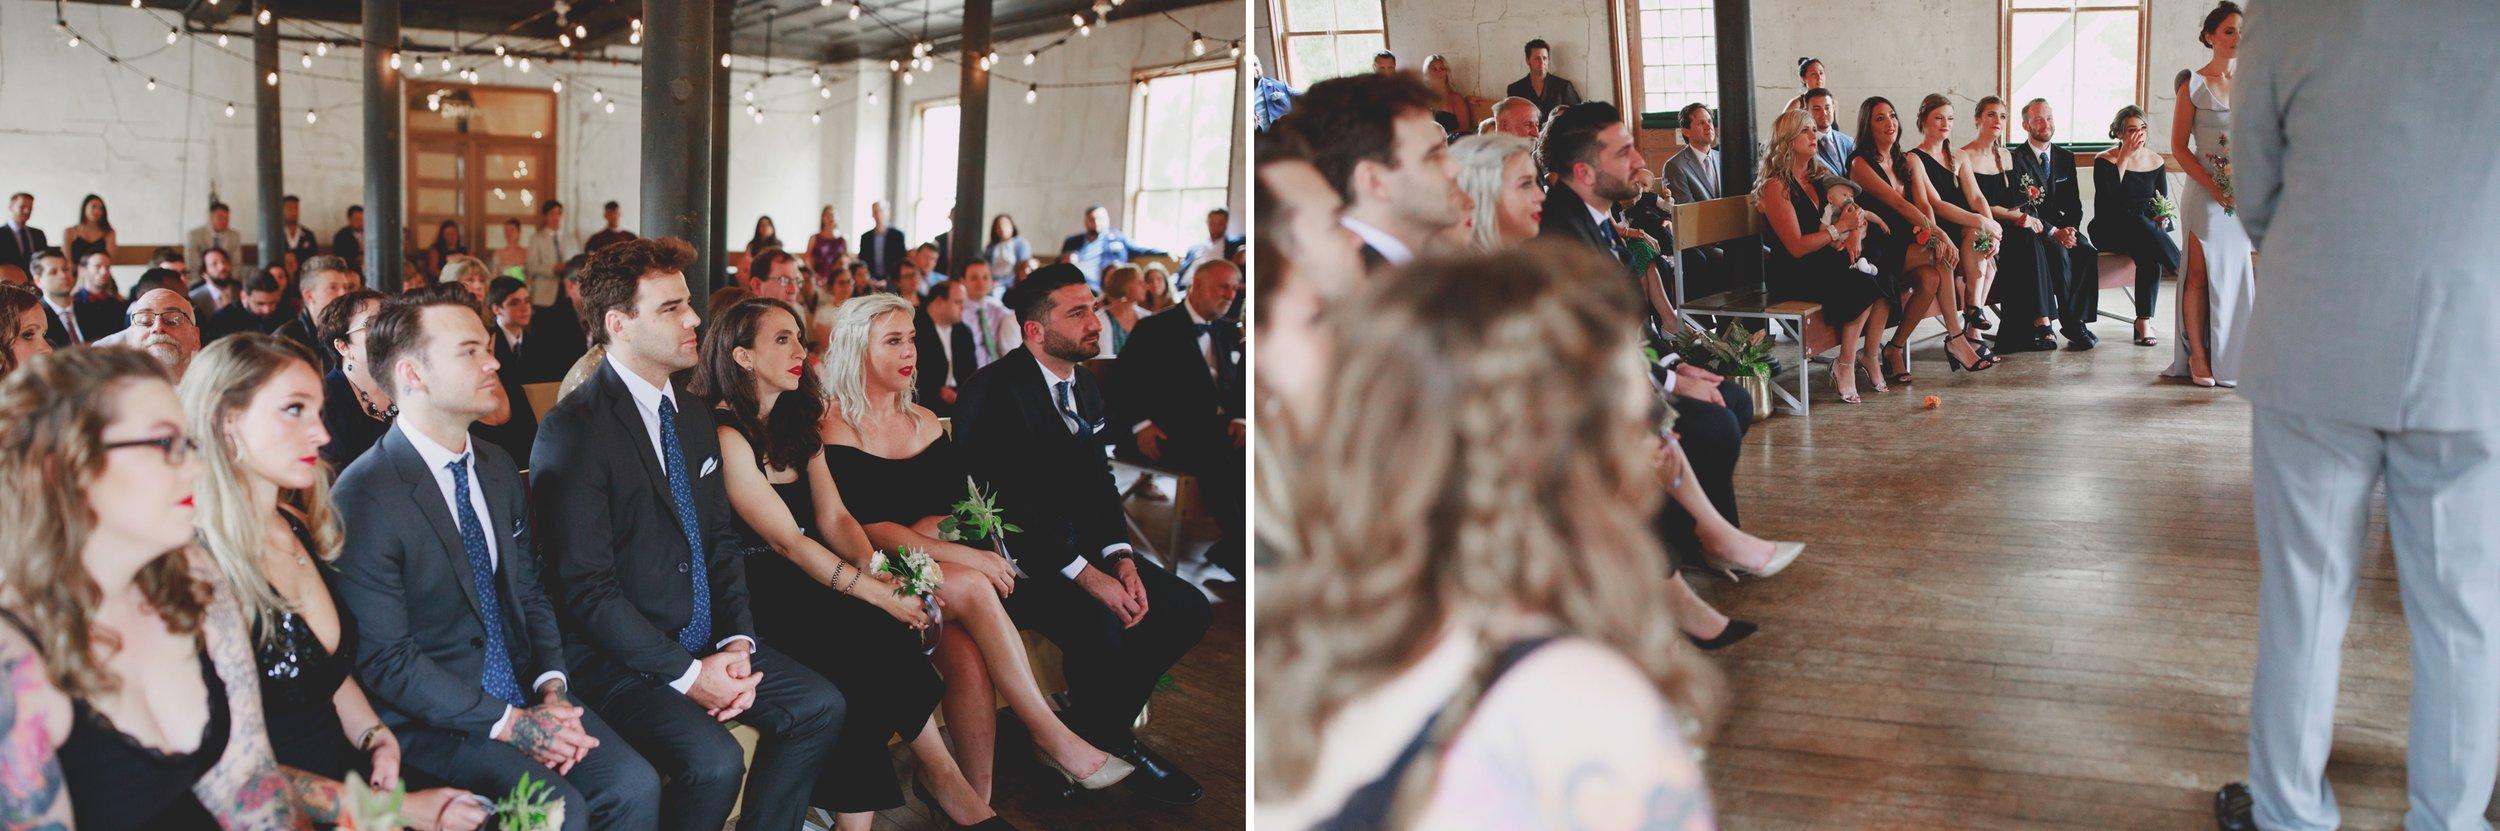 amandavanvels_headlands_center_wedding_san_francisco_097.jpg